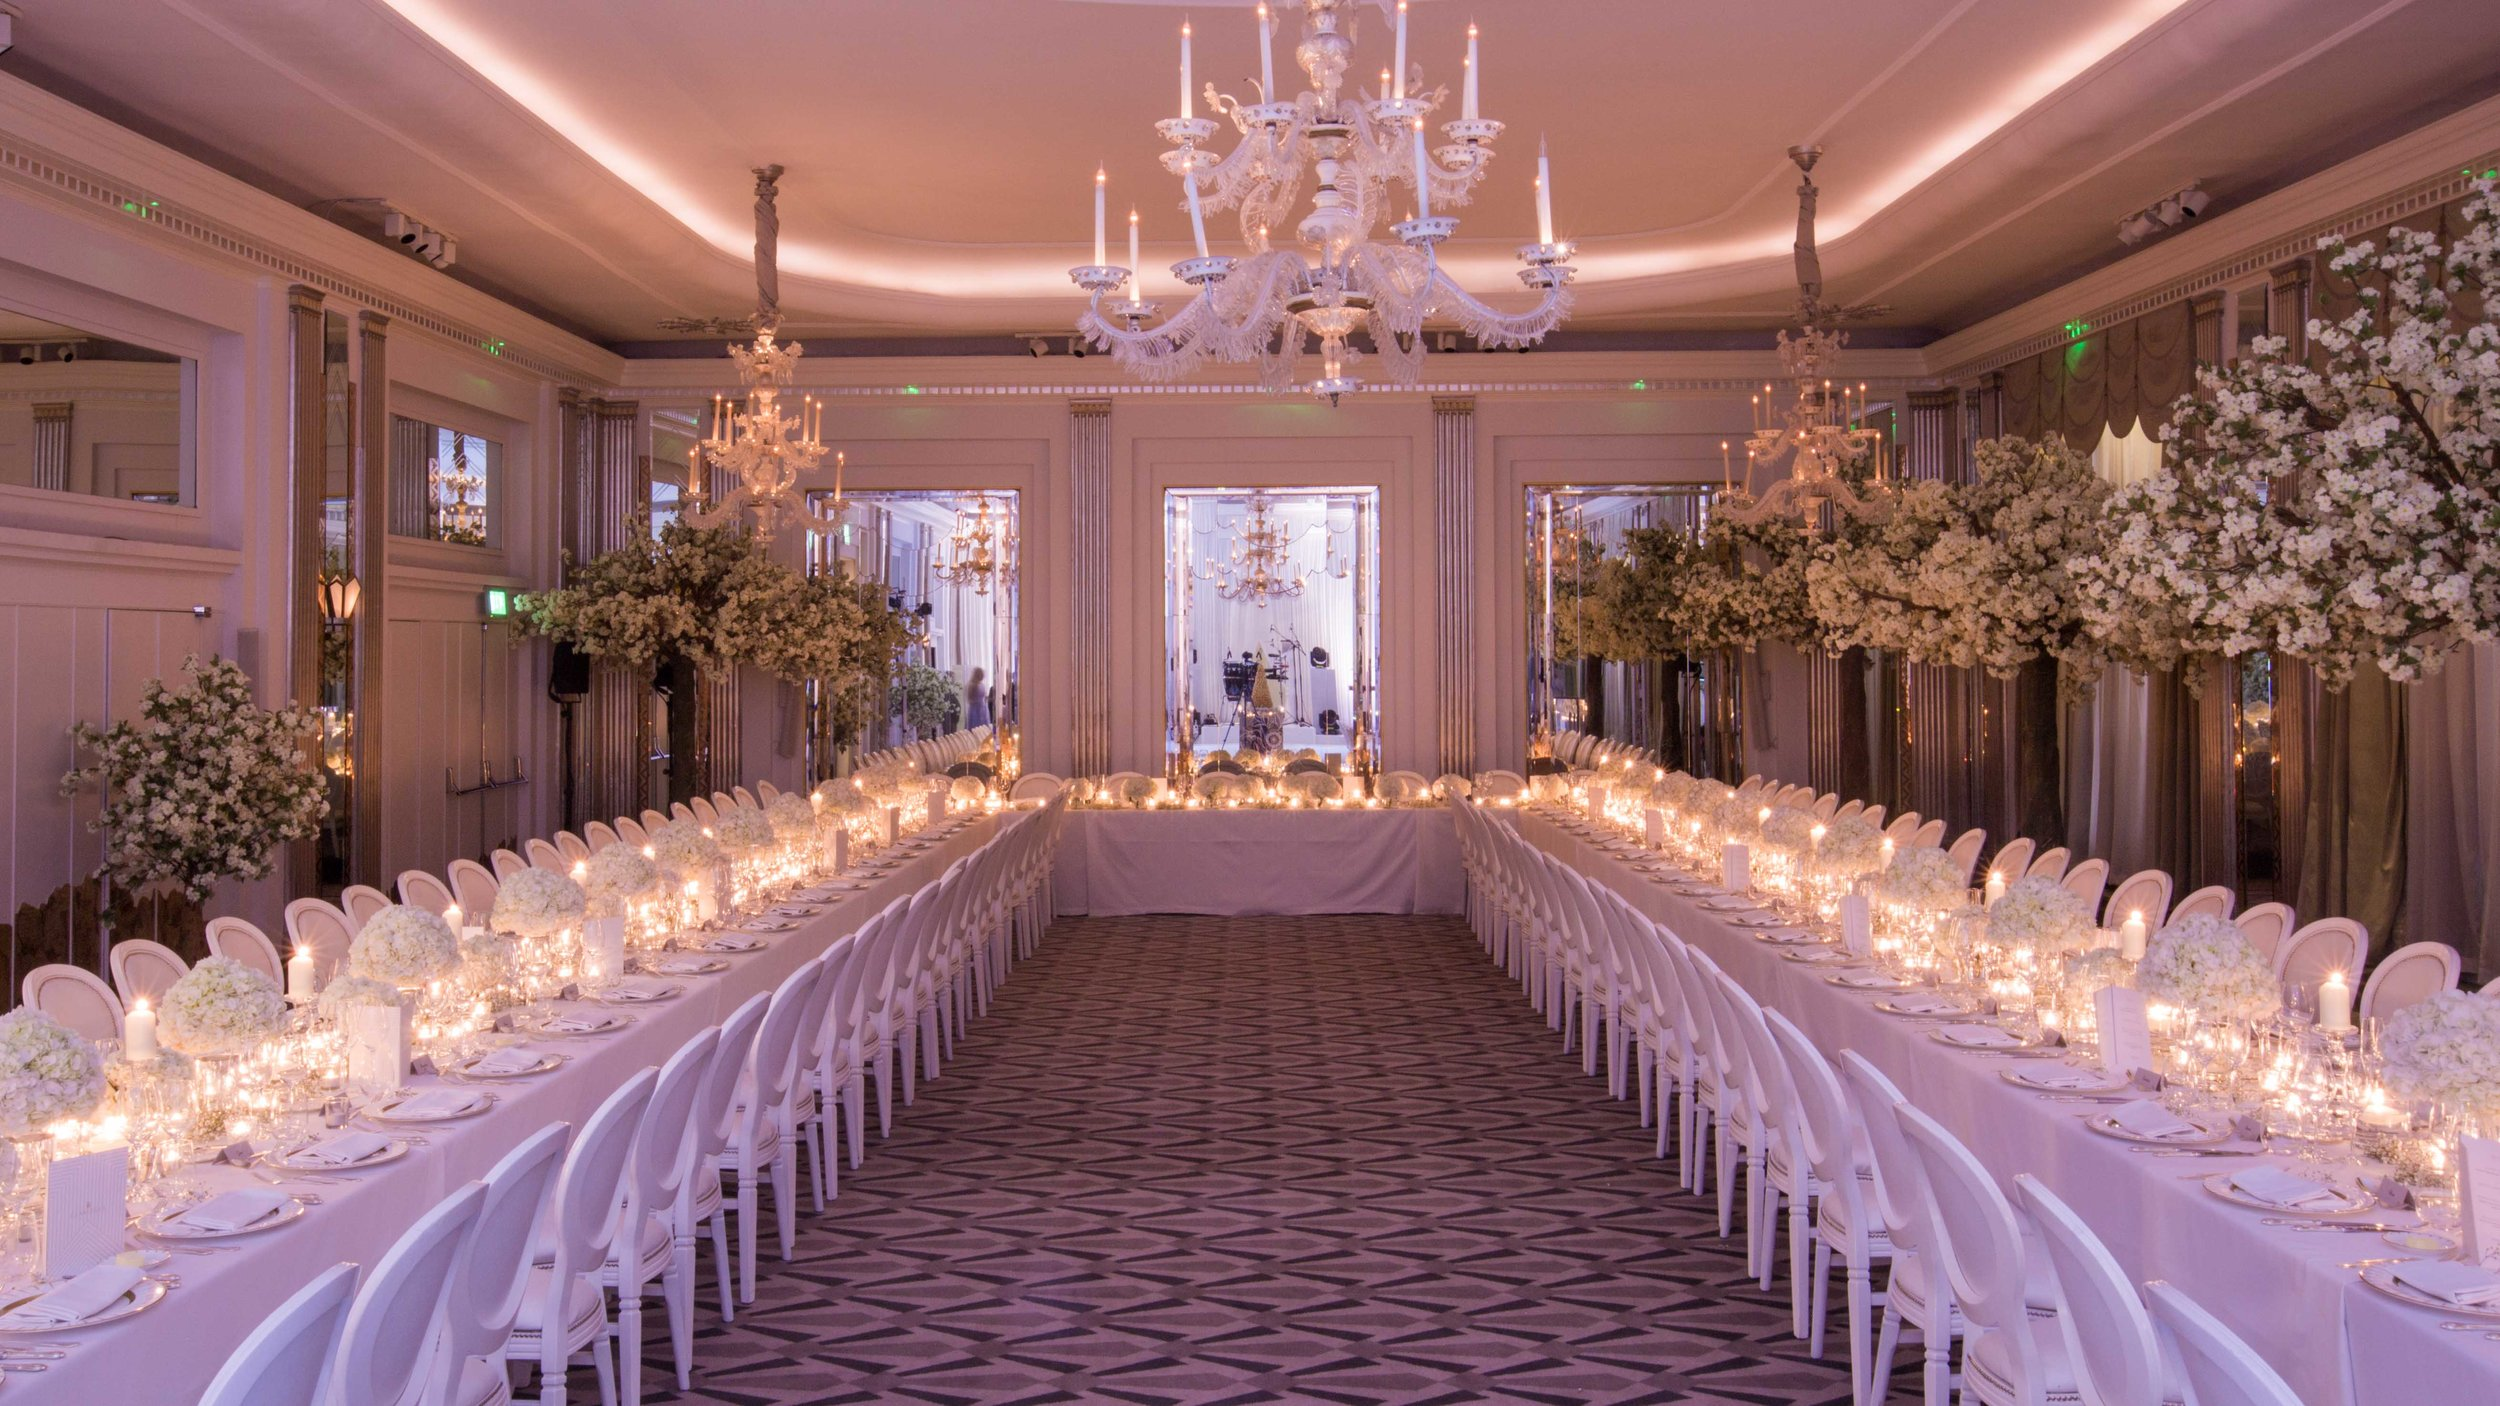 claridges-hotel-wedding-photographer-london-mayfair-natalia-smith-photography-99.jpg